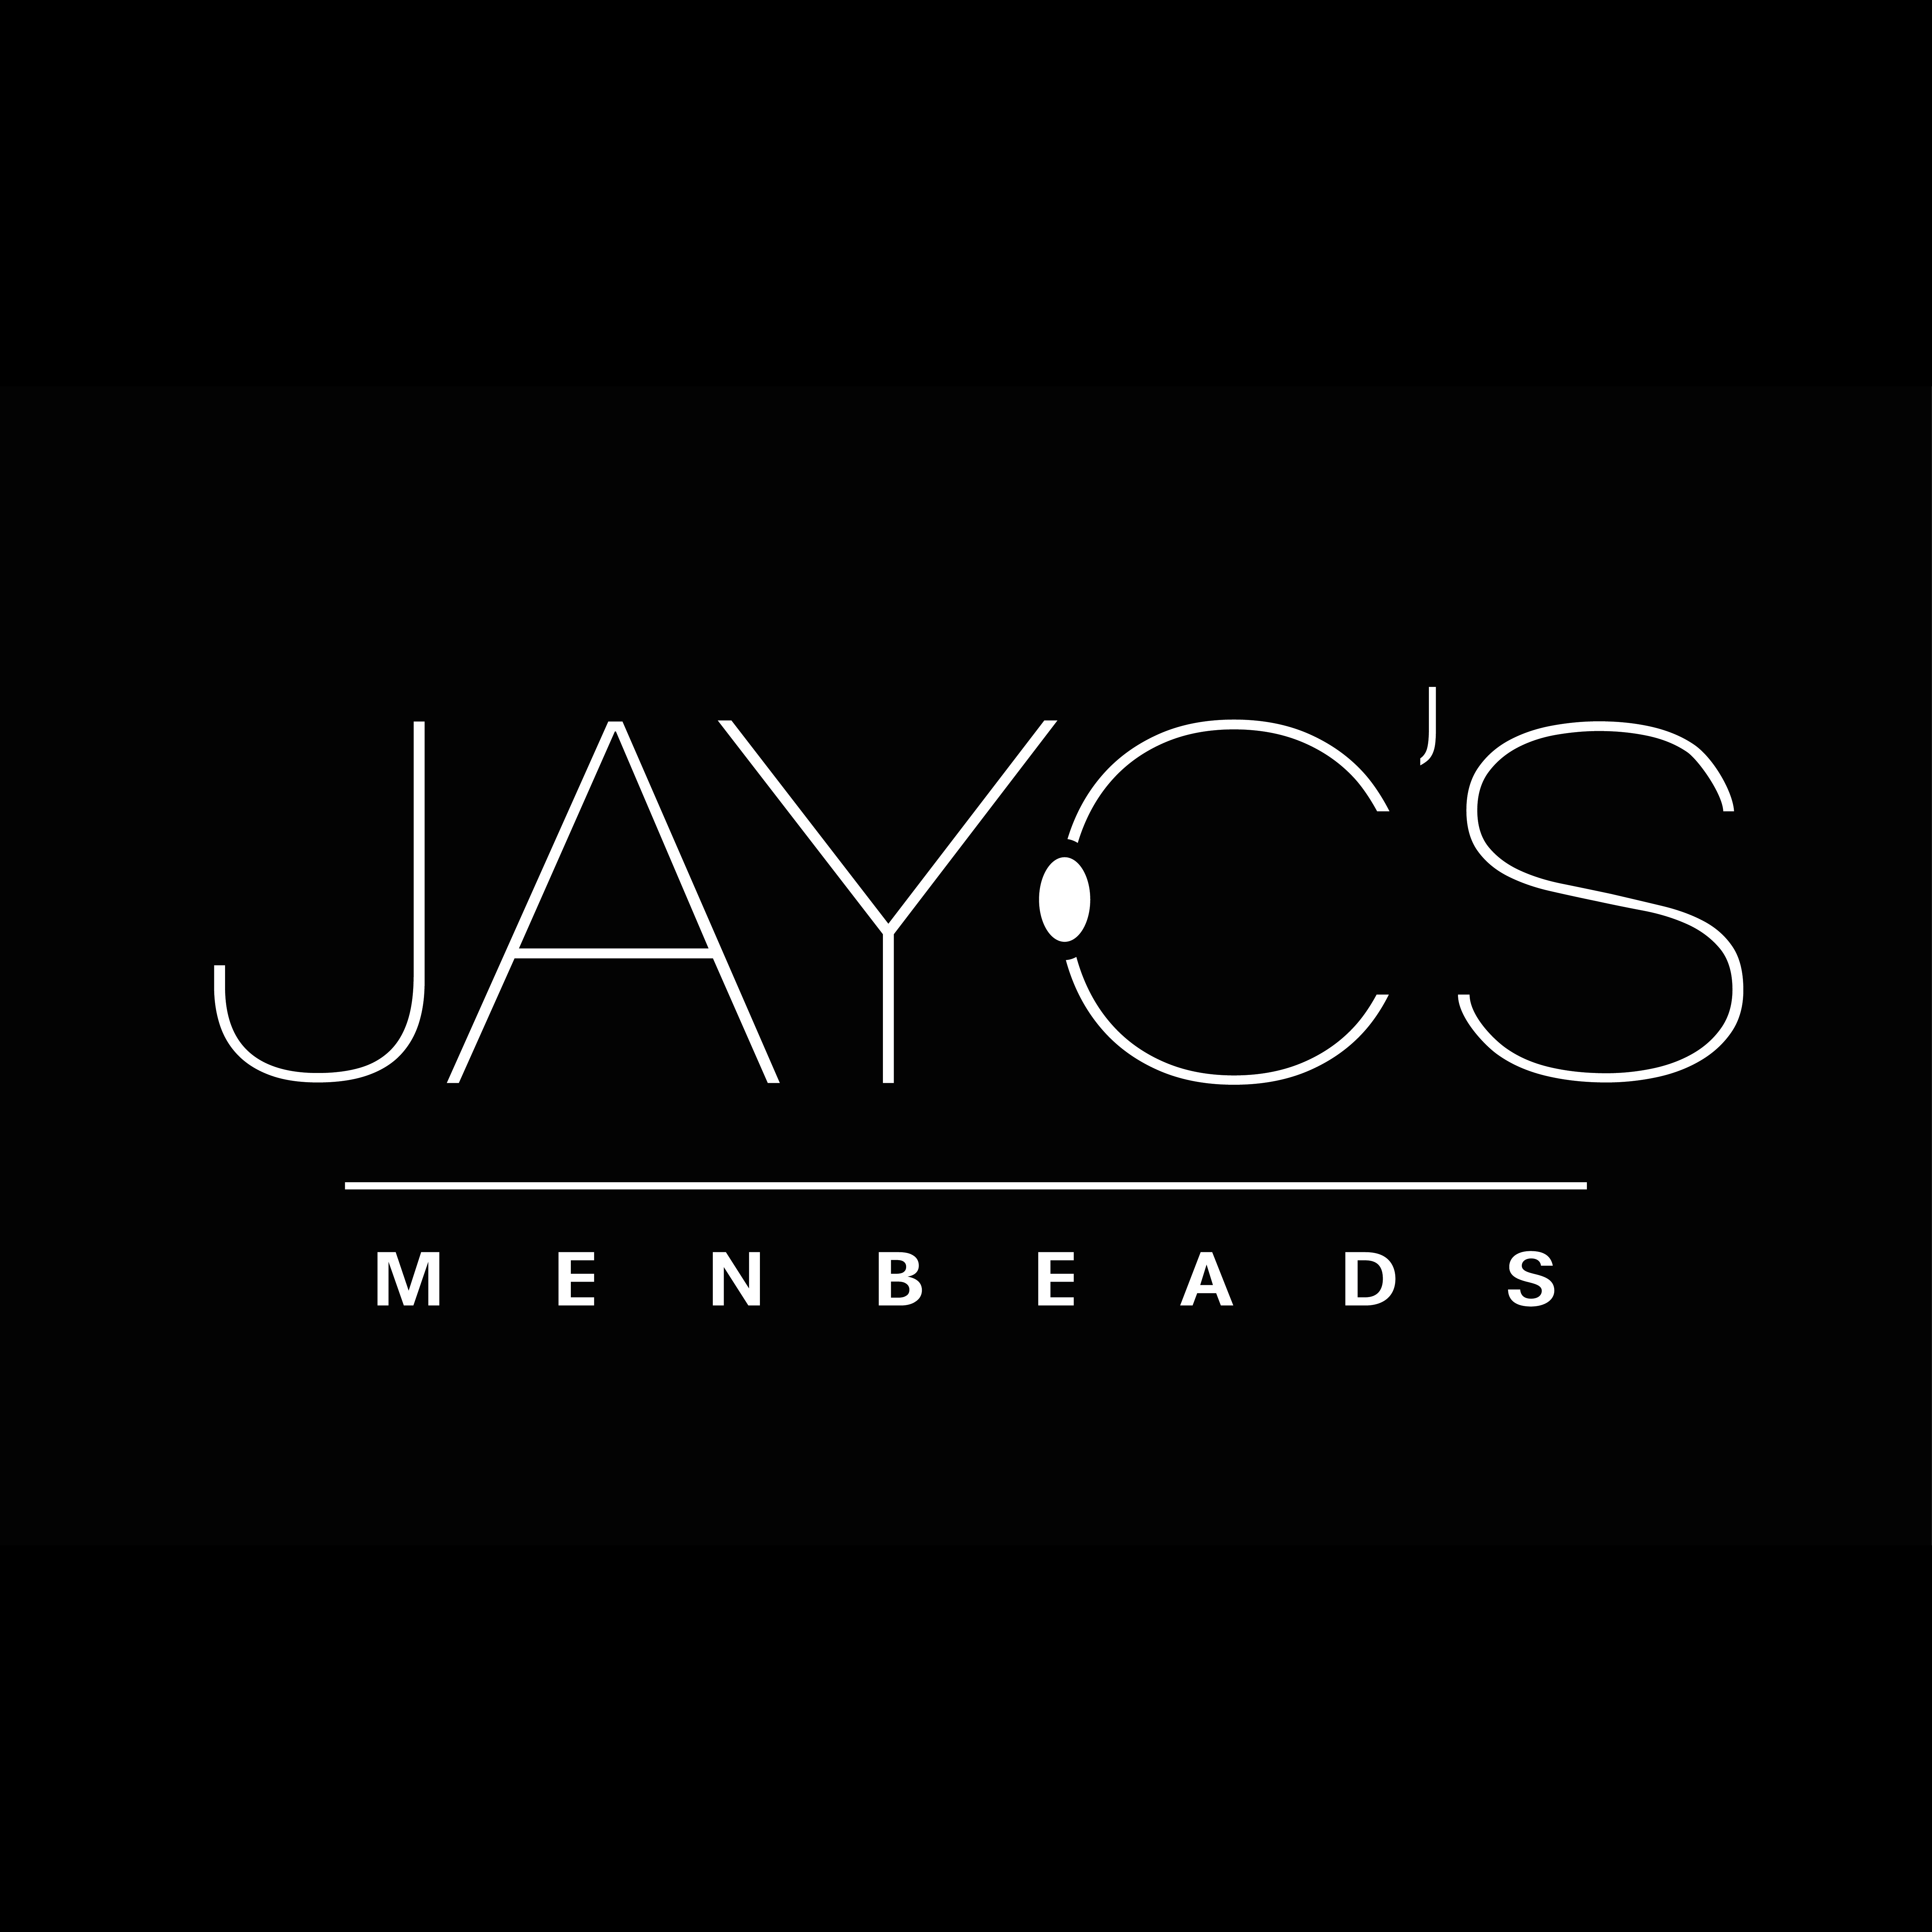 JayC's Menbeads